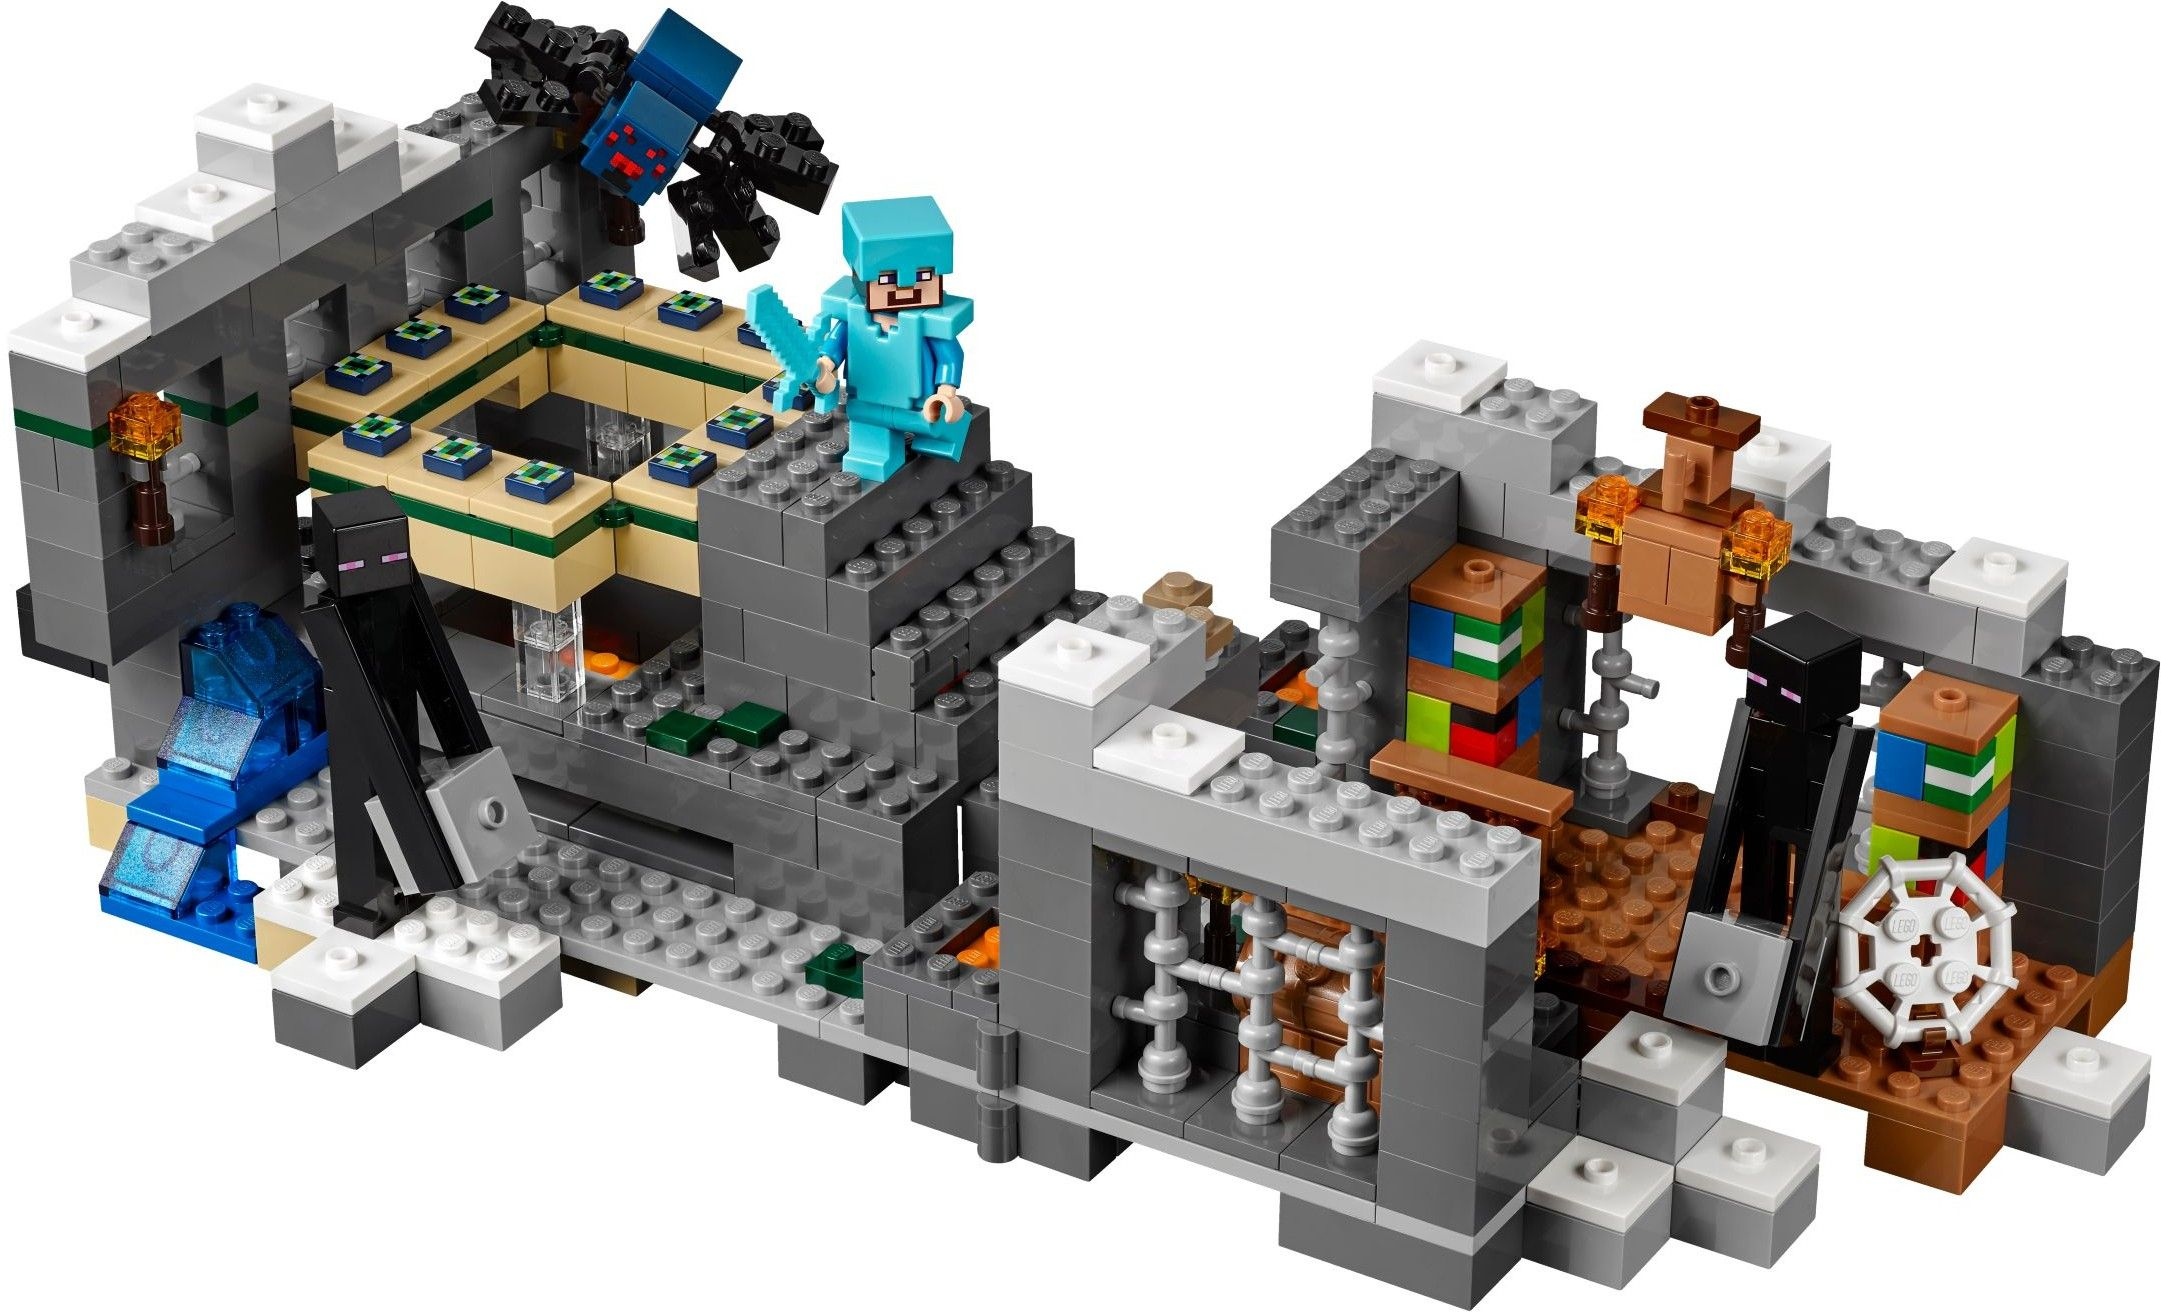 Картинки наборов лего майнкрафт и сколько они стоят